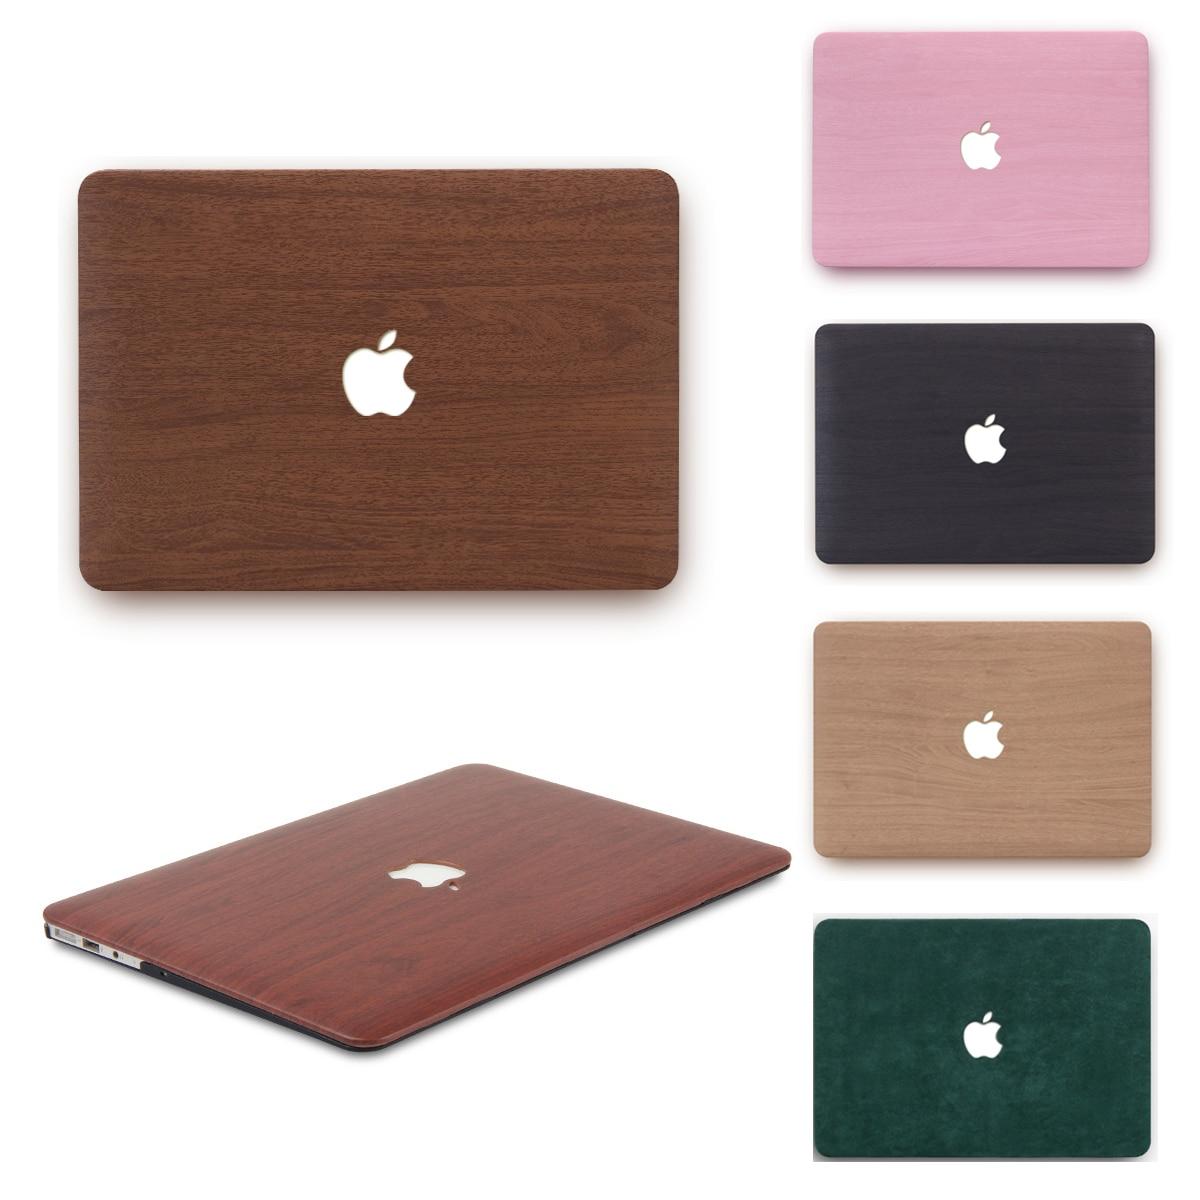 Чехол под дерево для Apple Macbook Pro Air 13 13,3 2020 A1466 A2289 A1932 Pro Retina 13 15 дюймов Touch Bar A1502